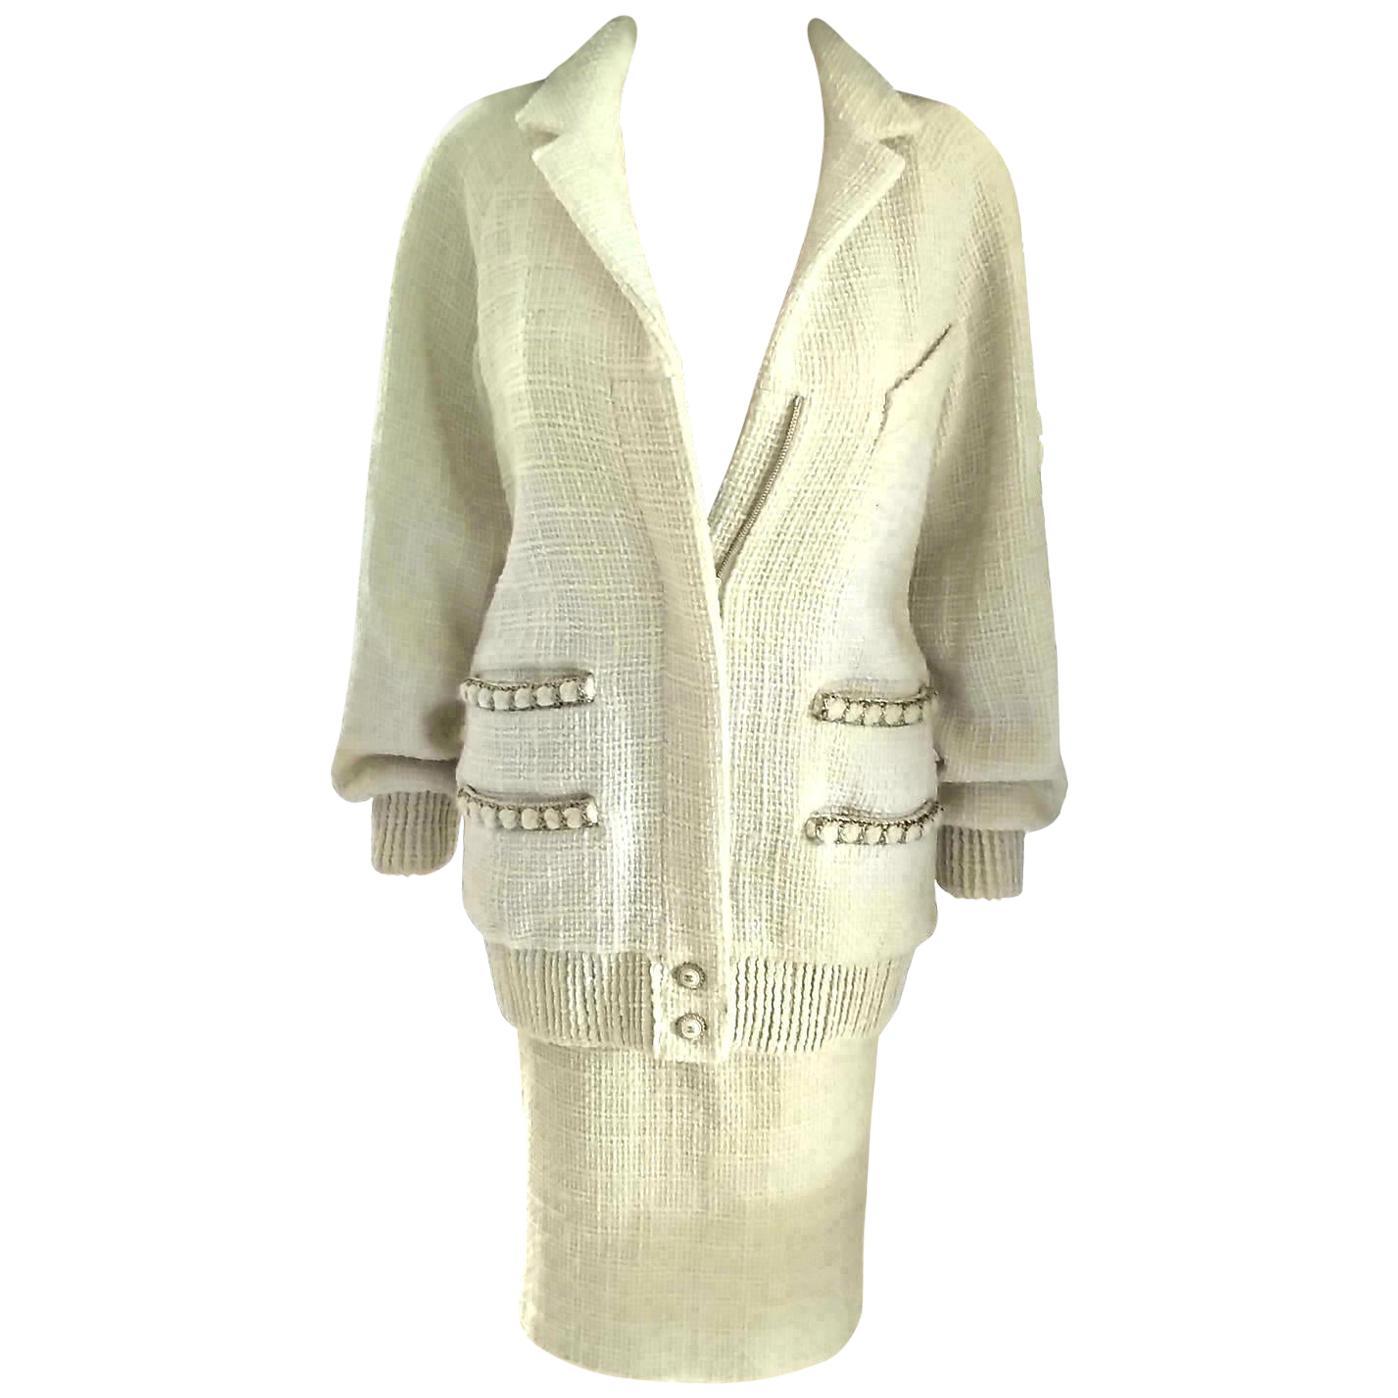 Chanel 2020 20C Ecru, Gold, Pearl CC Tweed Jacket Skirt Suit FR 36 US 4 6